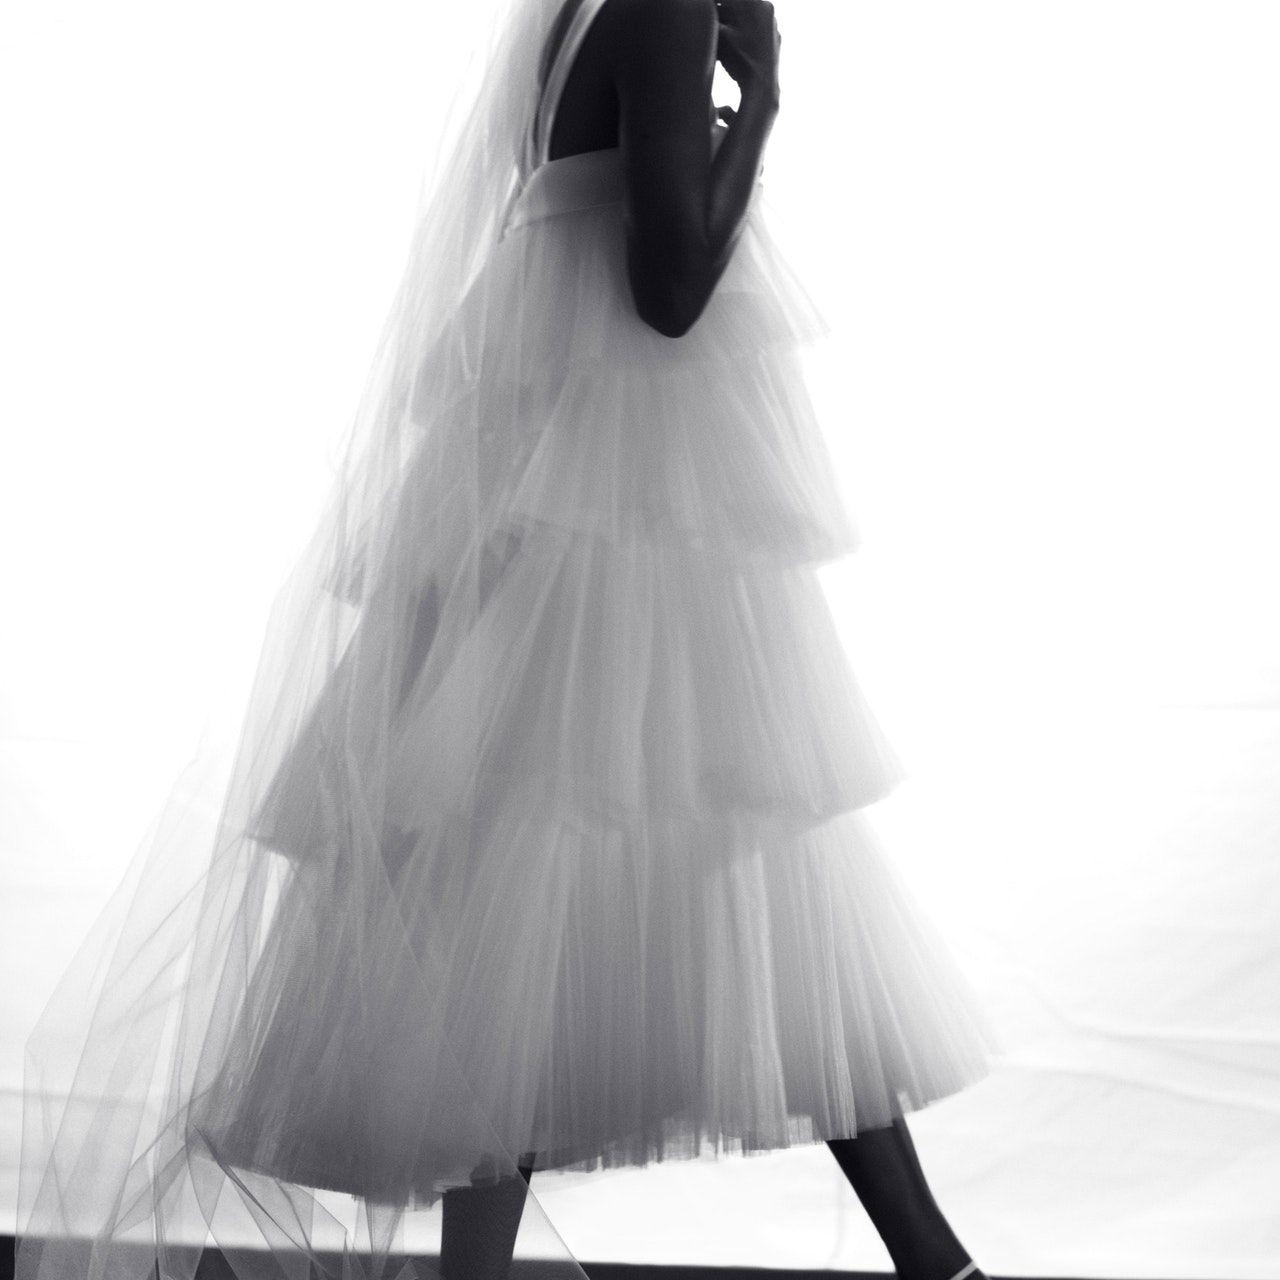 hair bow and wedding dress